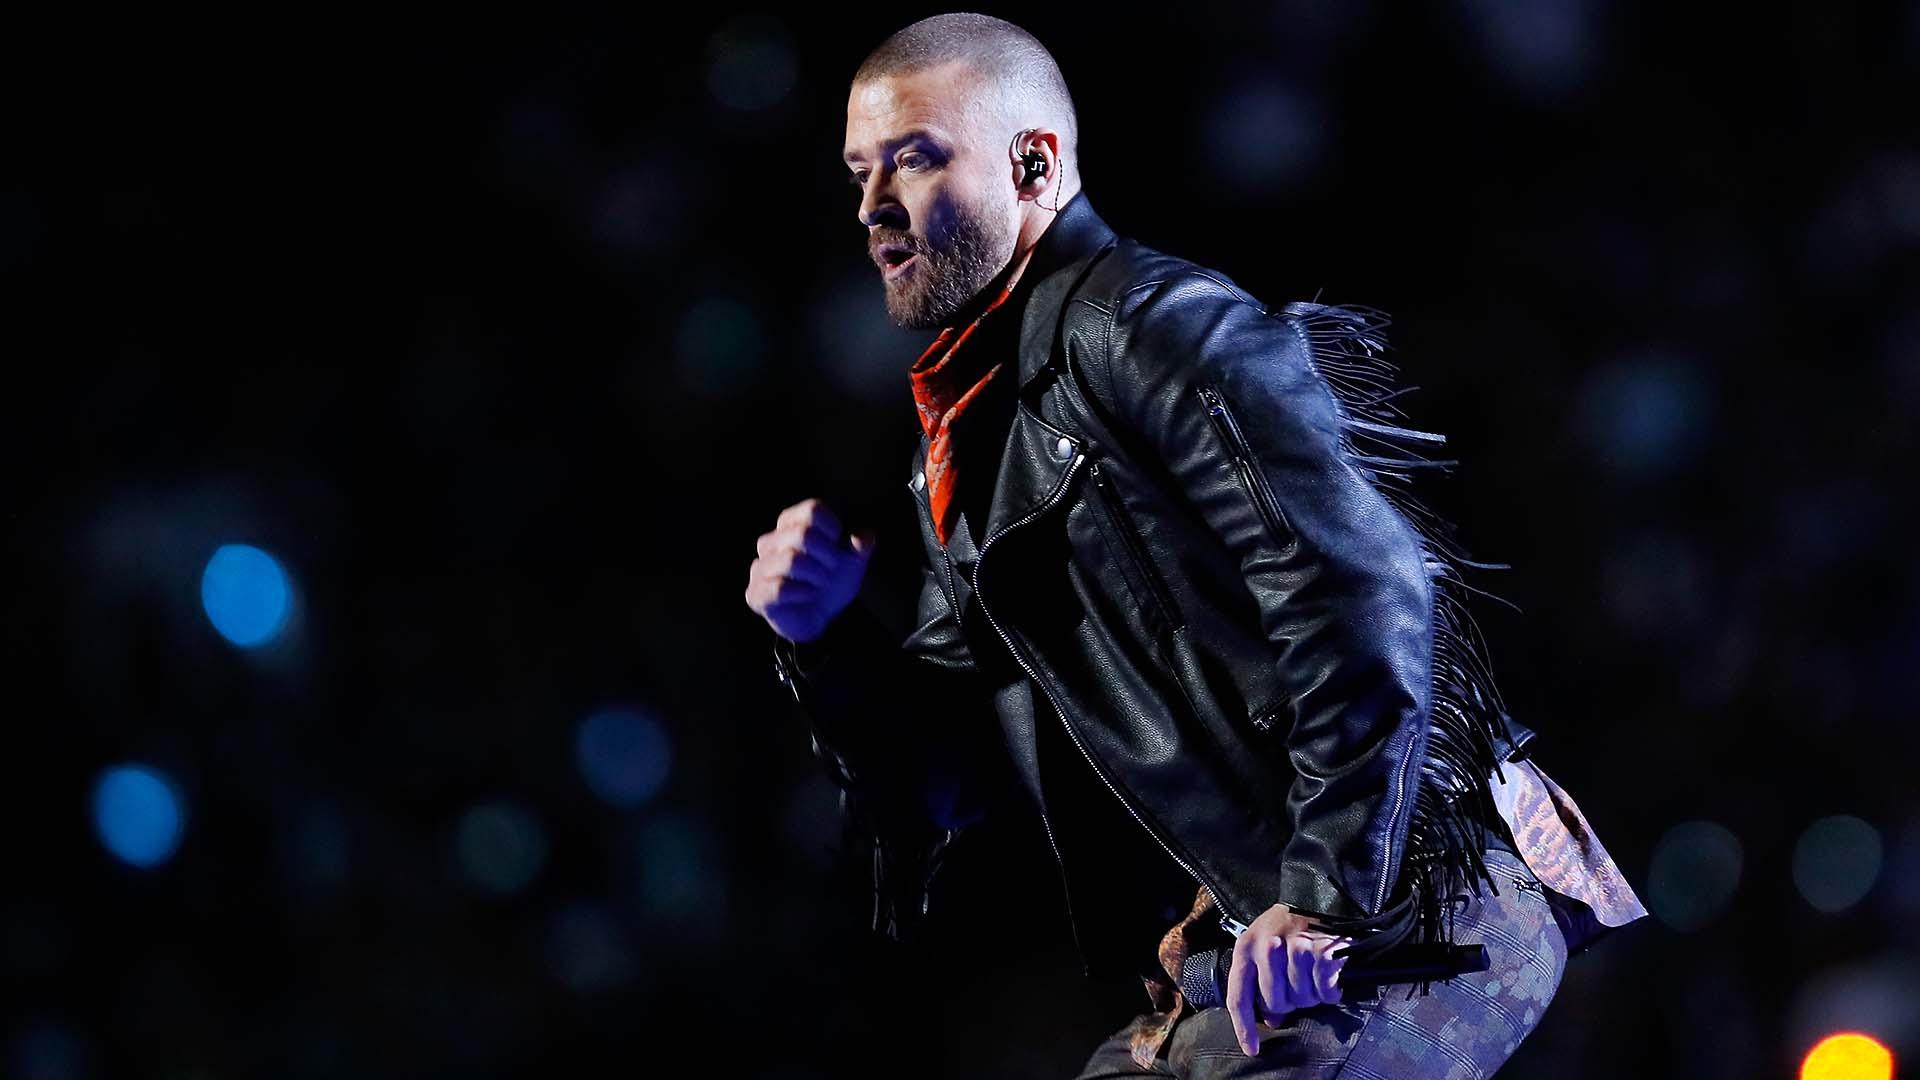 Justin Timberlake performs on the Pepsi Super Bowl